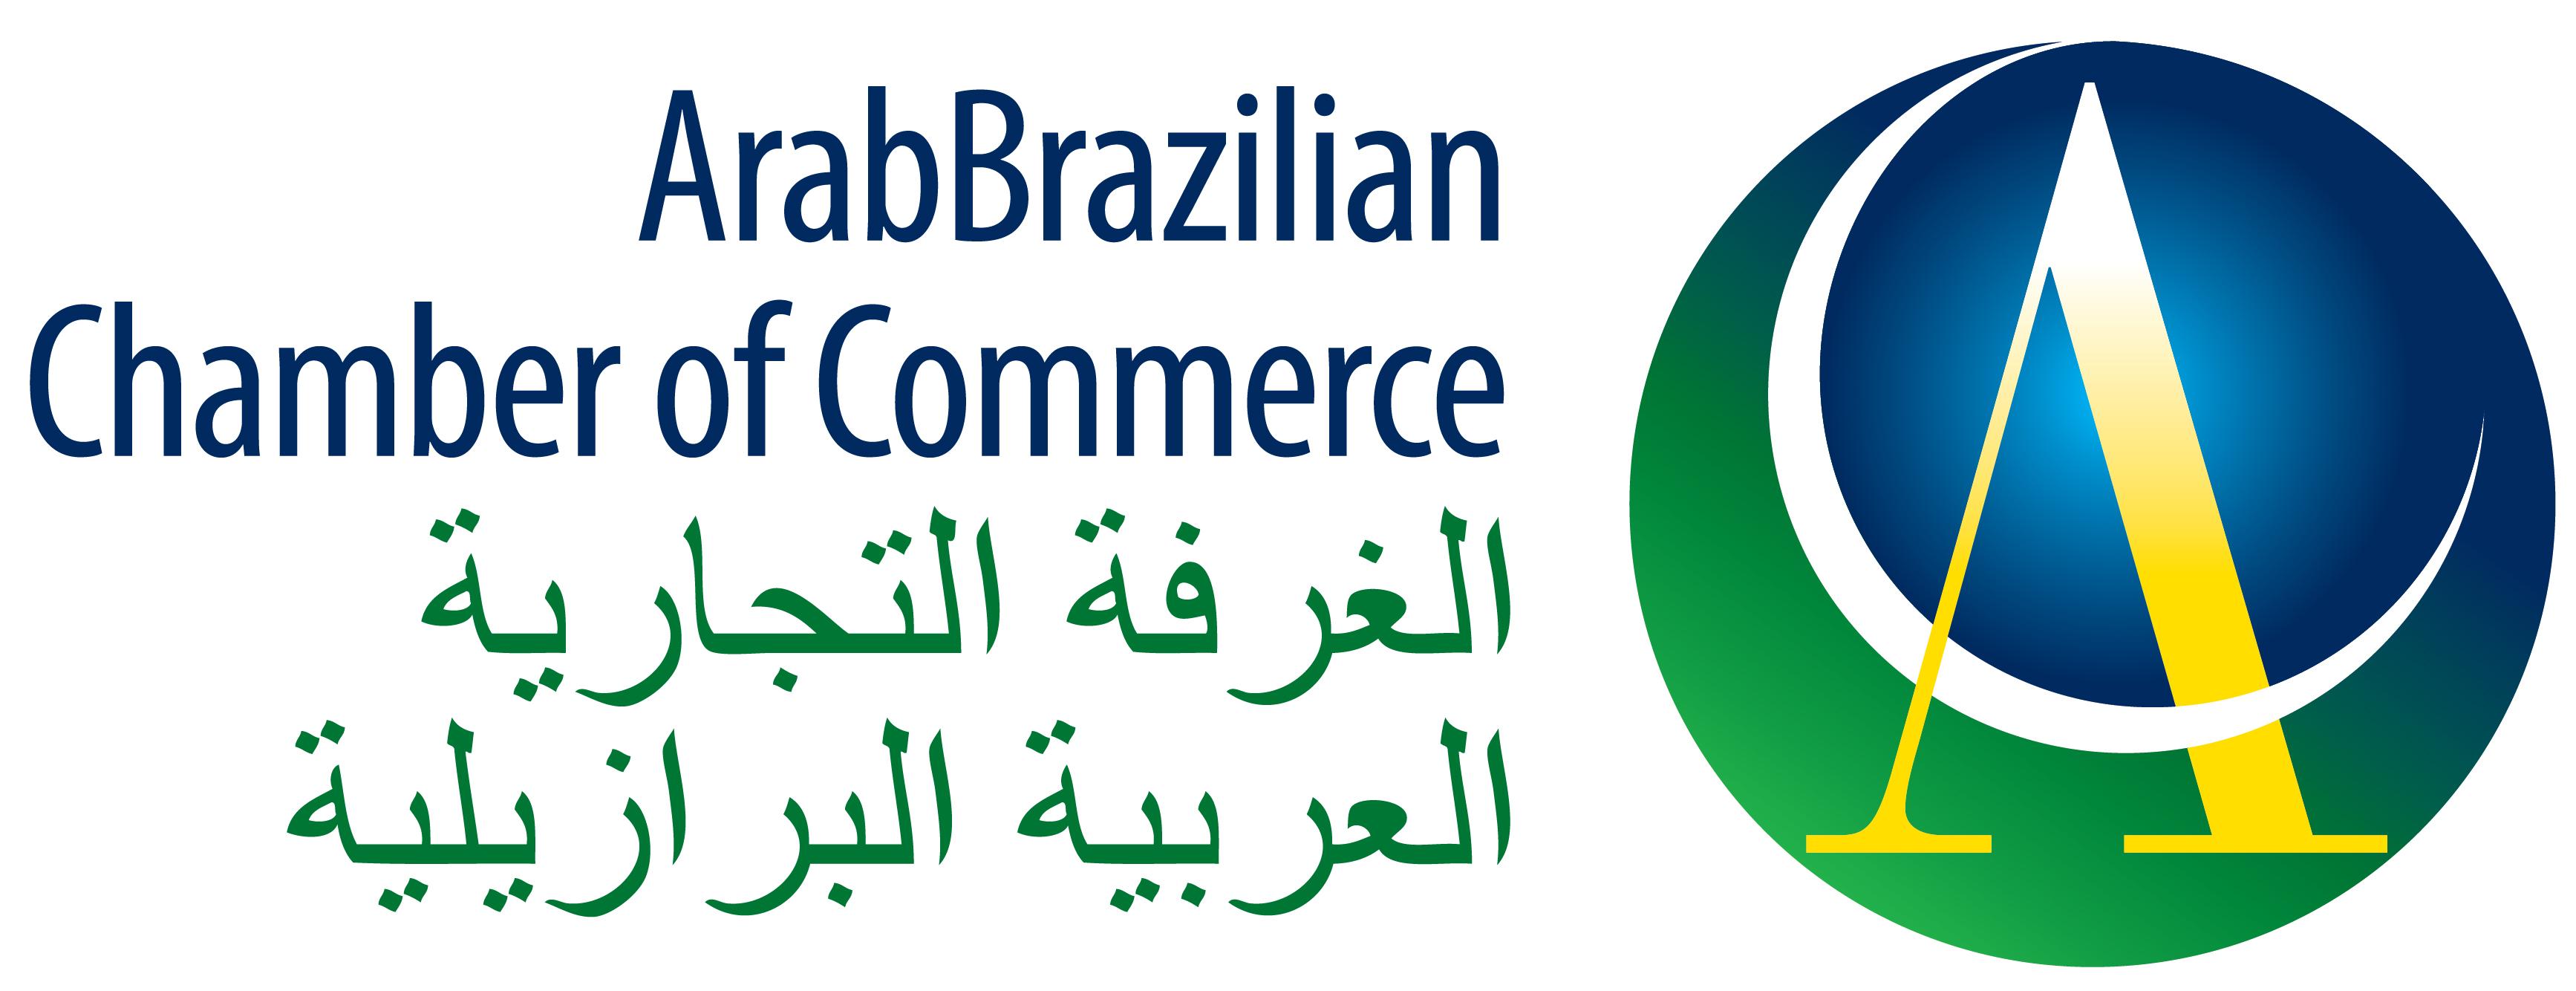 The Arab Brazilian Chamber of Commerce